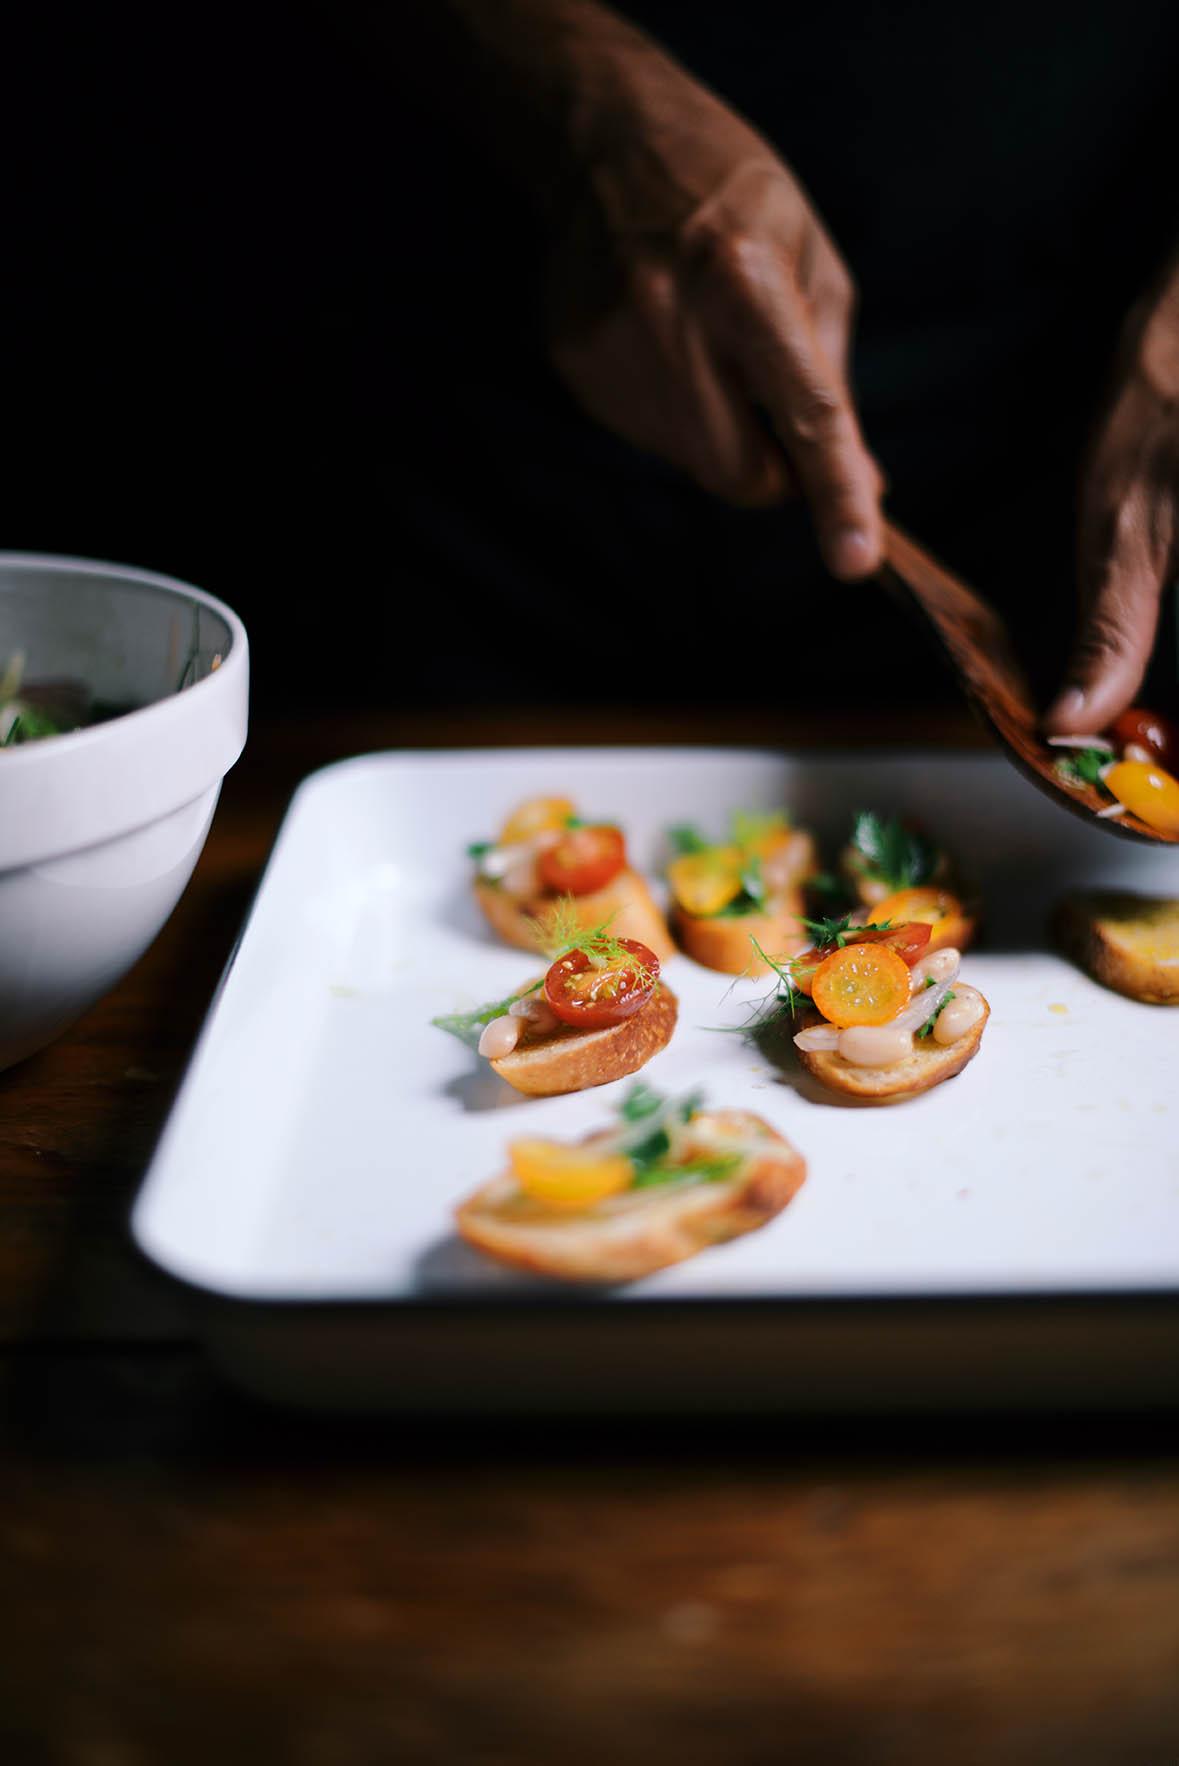 whitebean kumquat brushchetta | A Brown Table